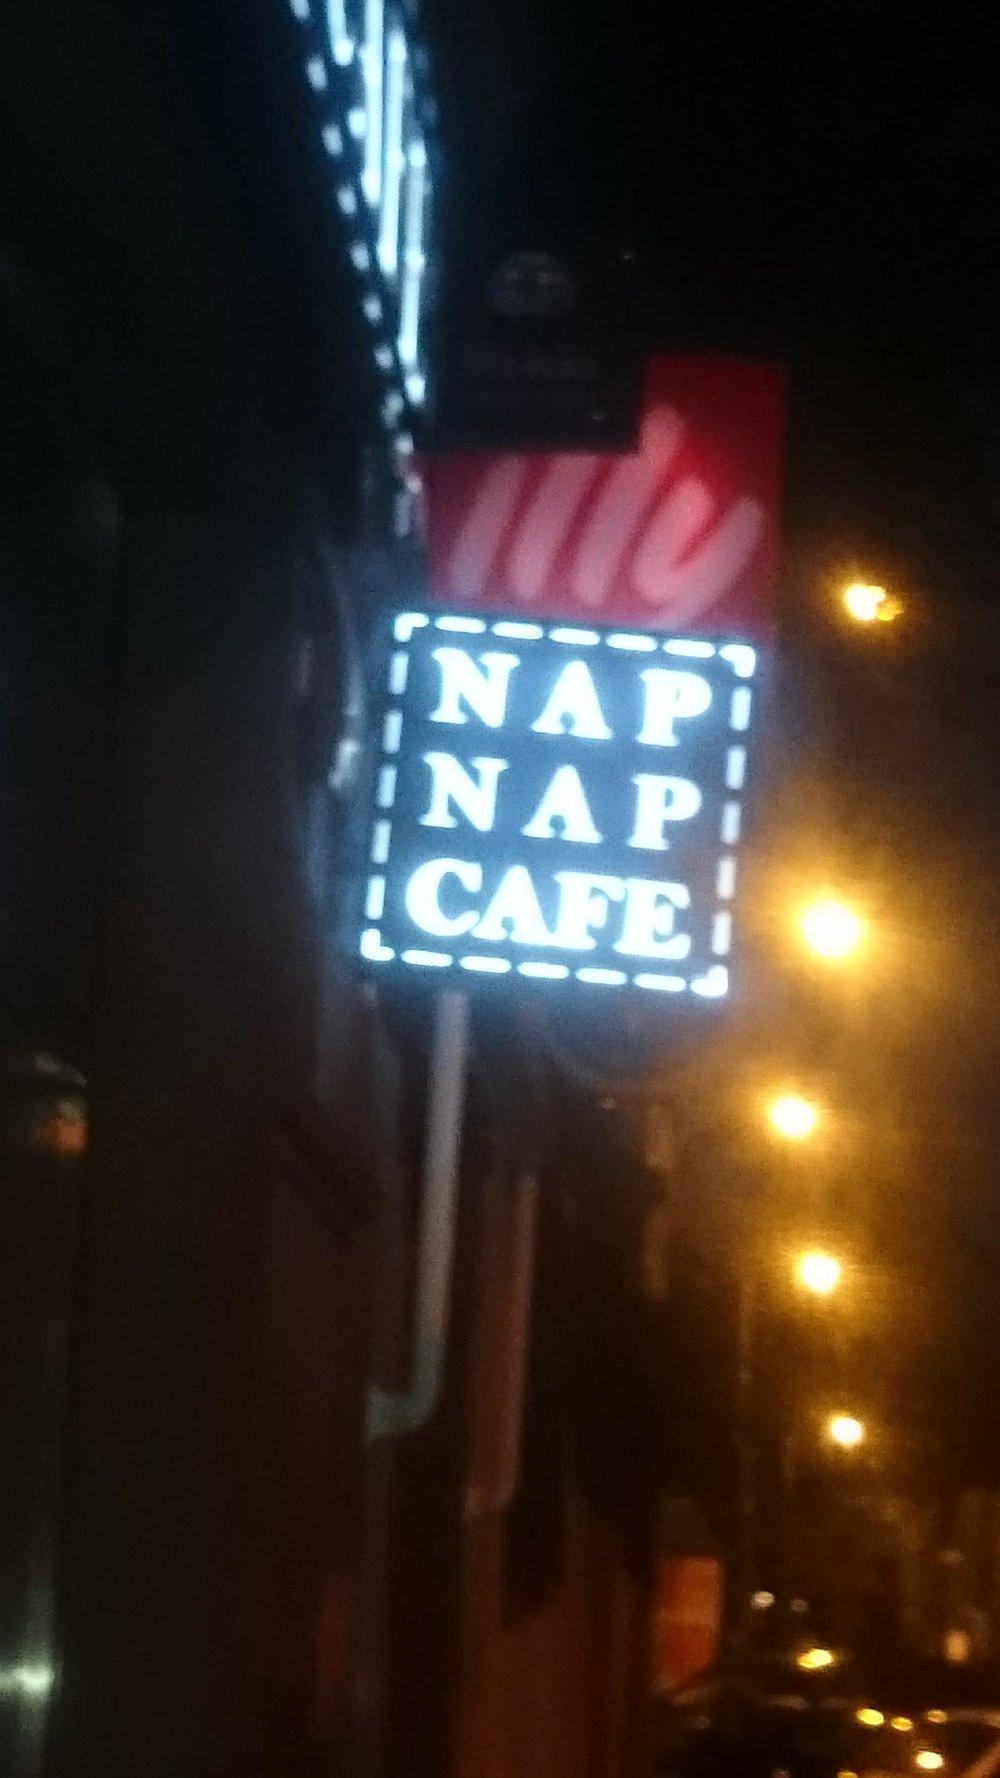 krakow nap nap cafe.jpg